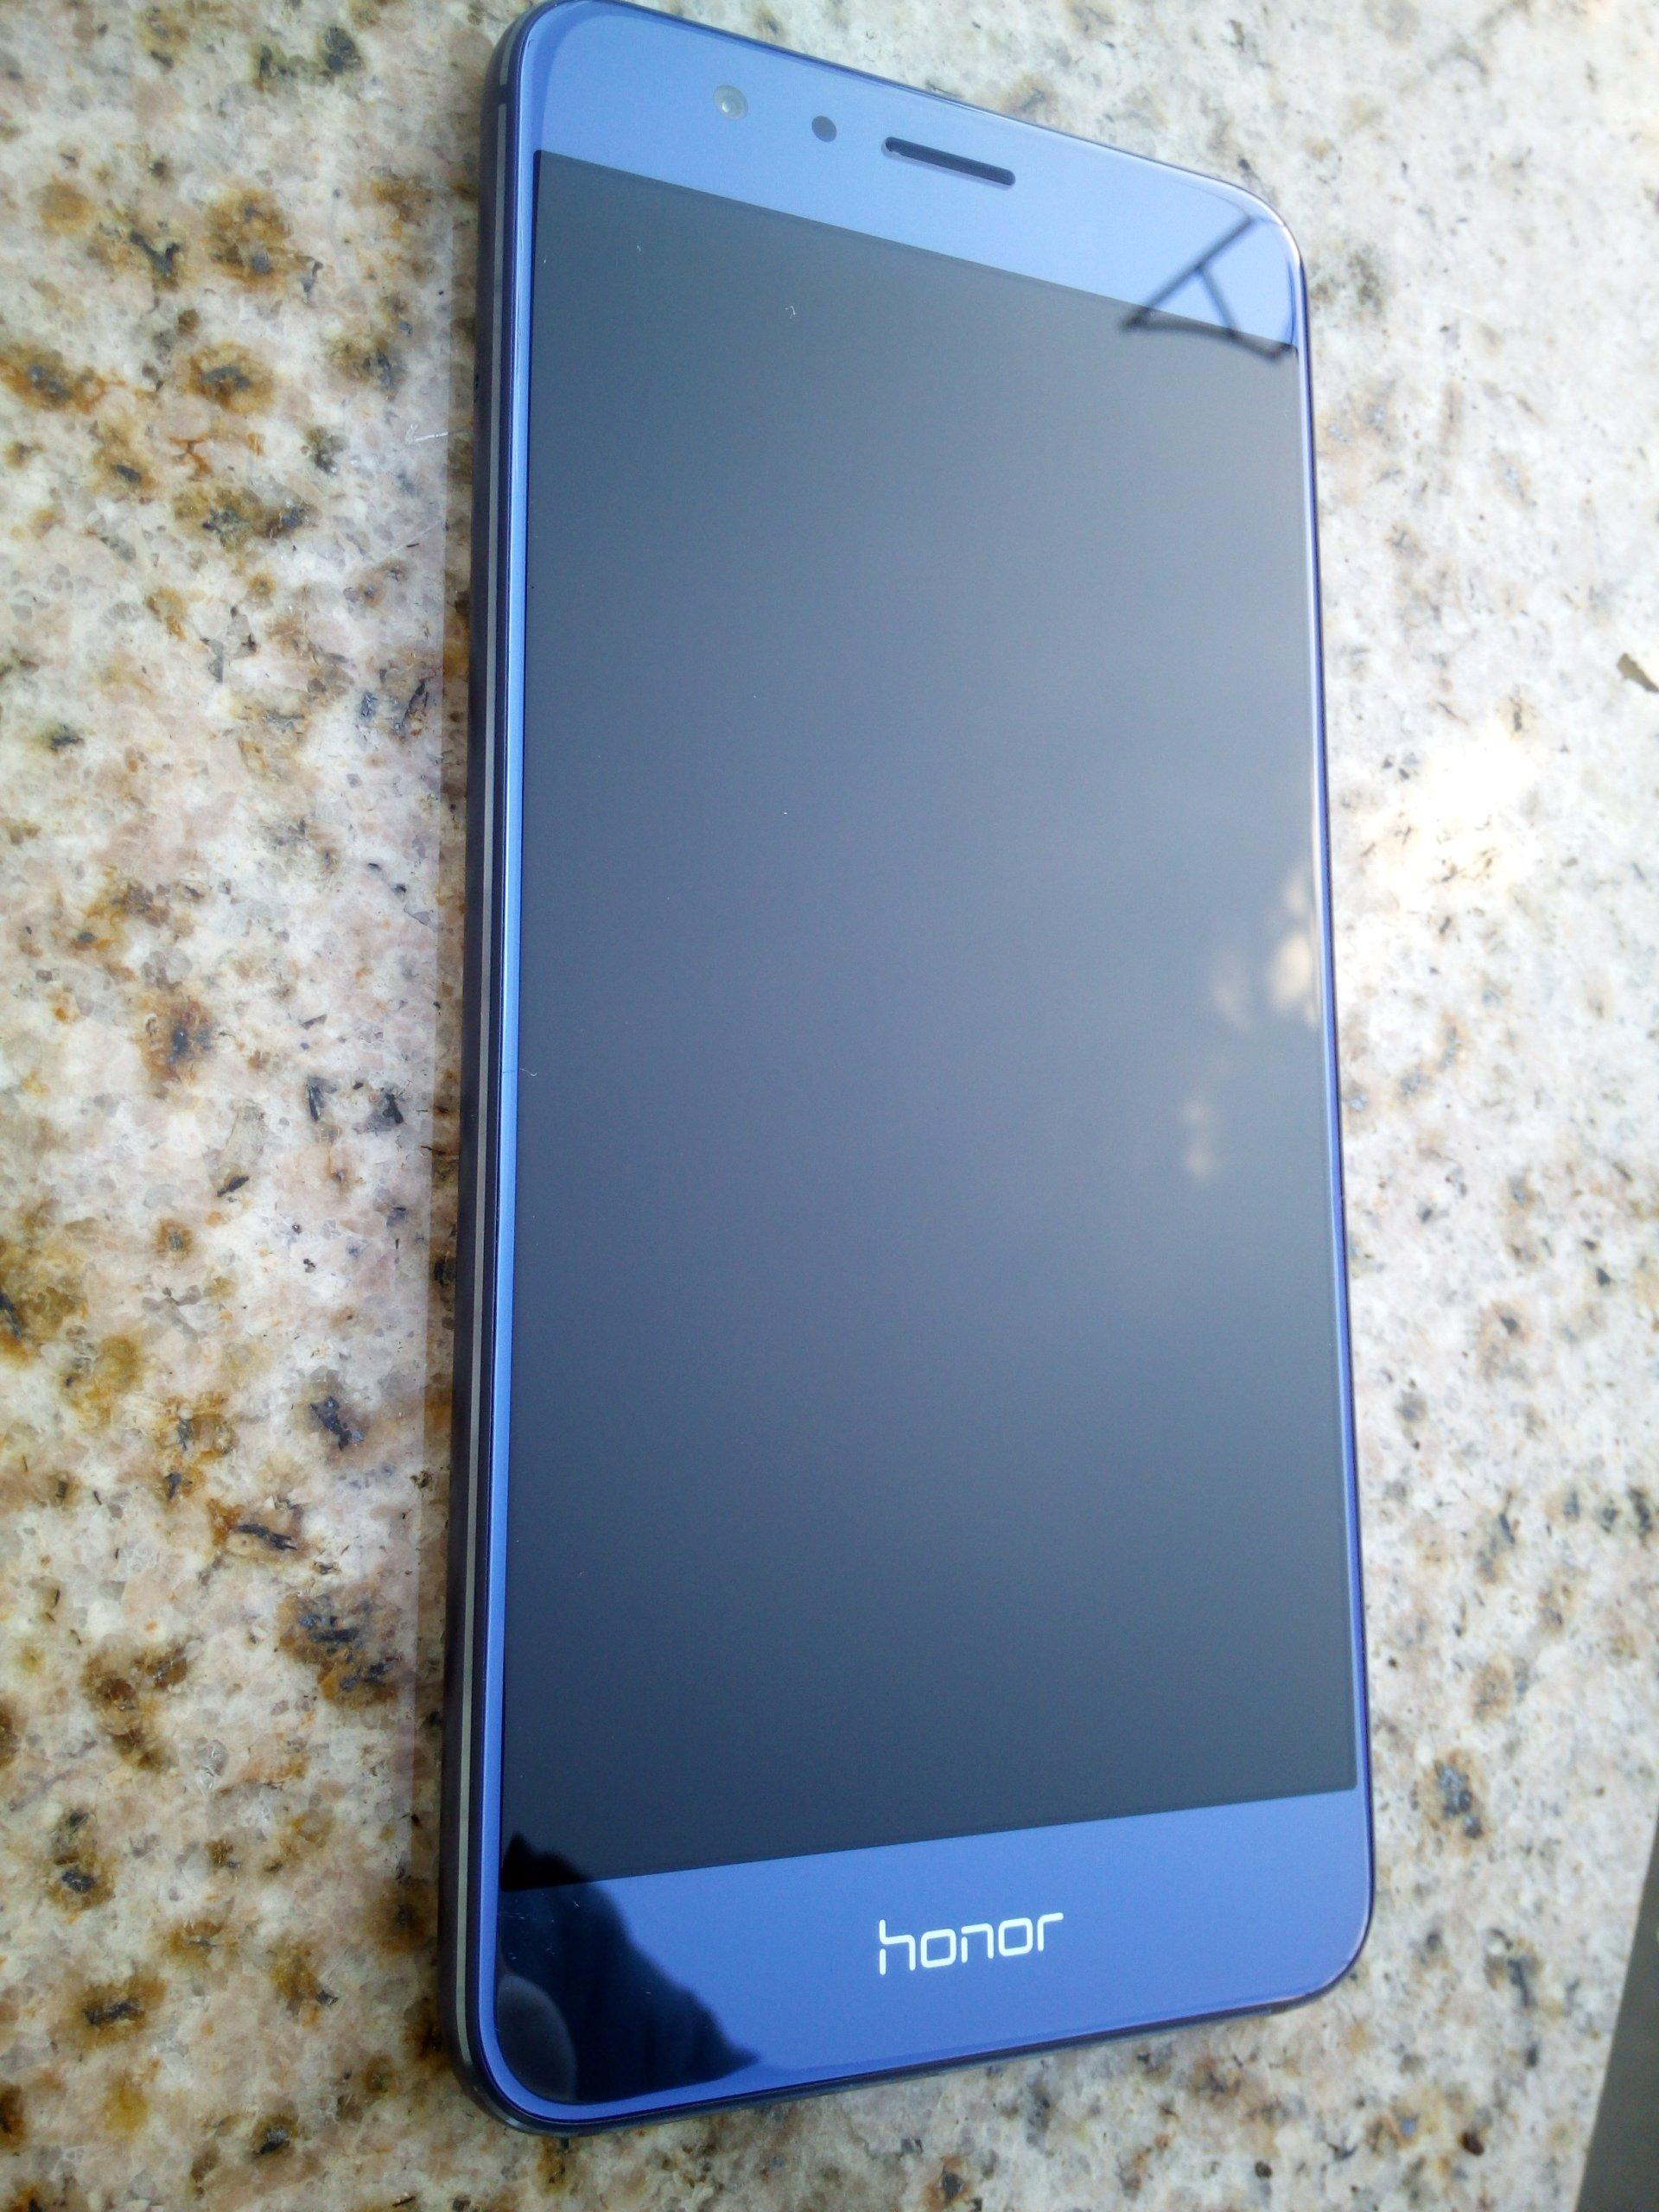 Huawei Honor 8 7067944221 Oficjalne Archiwum Allegro